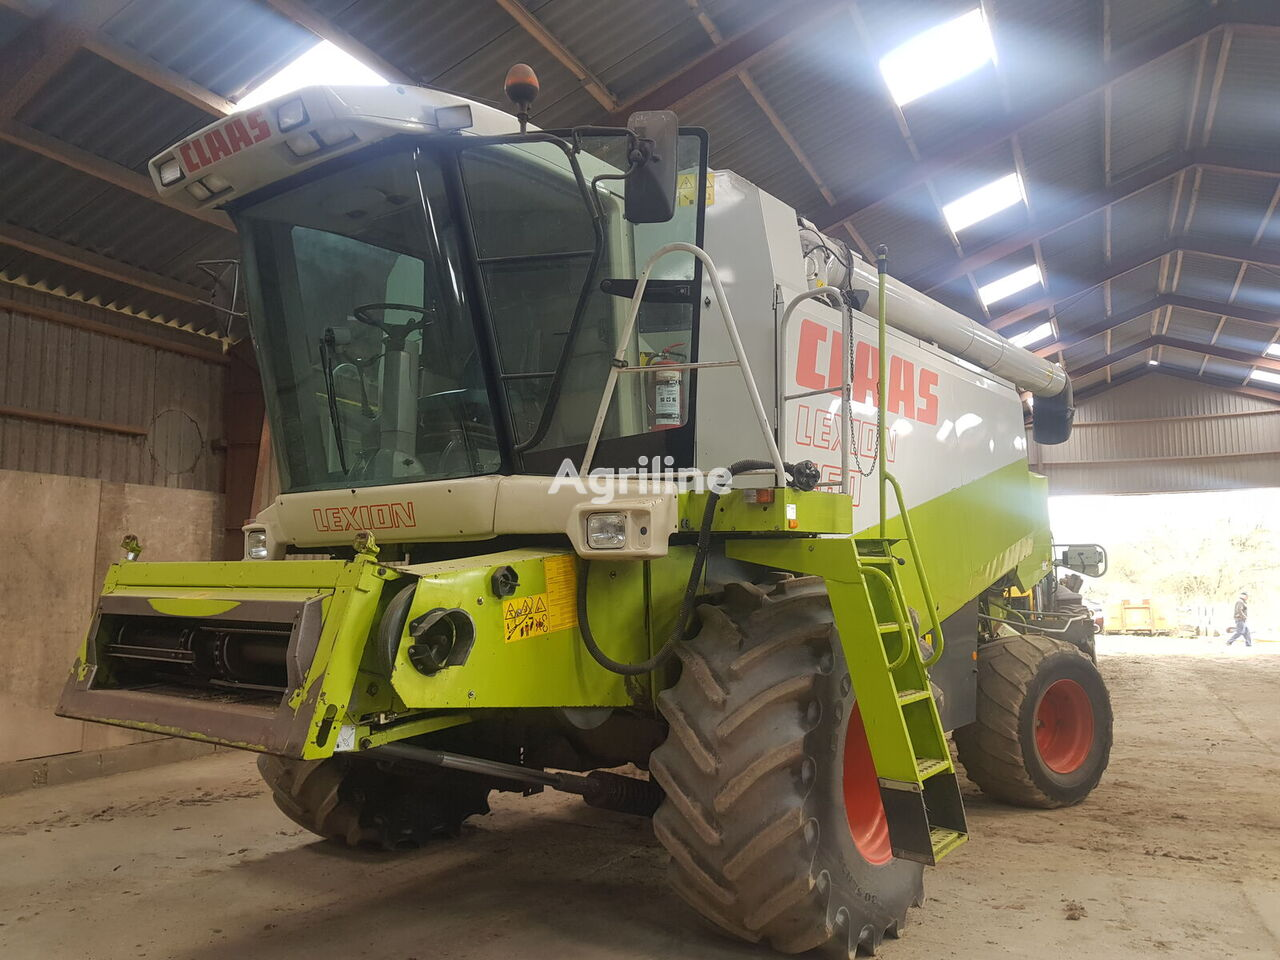 CLAAS Lexion 460 grain harvester